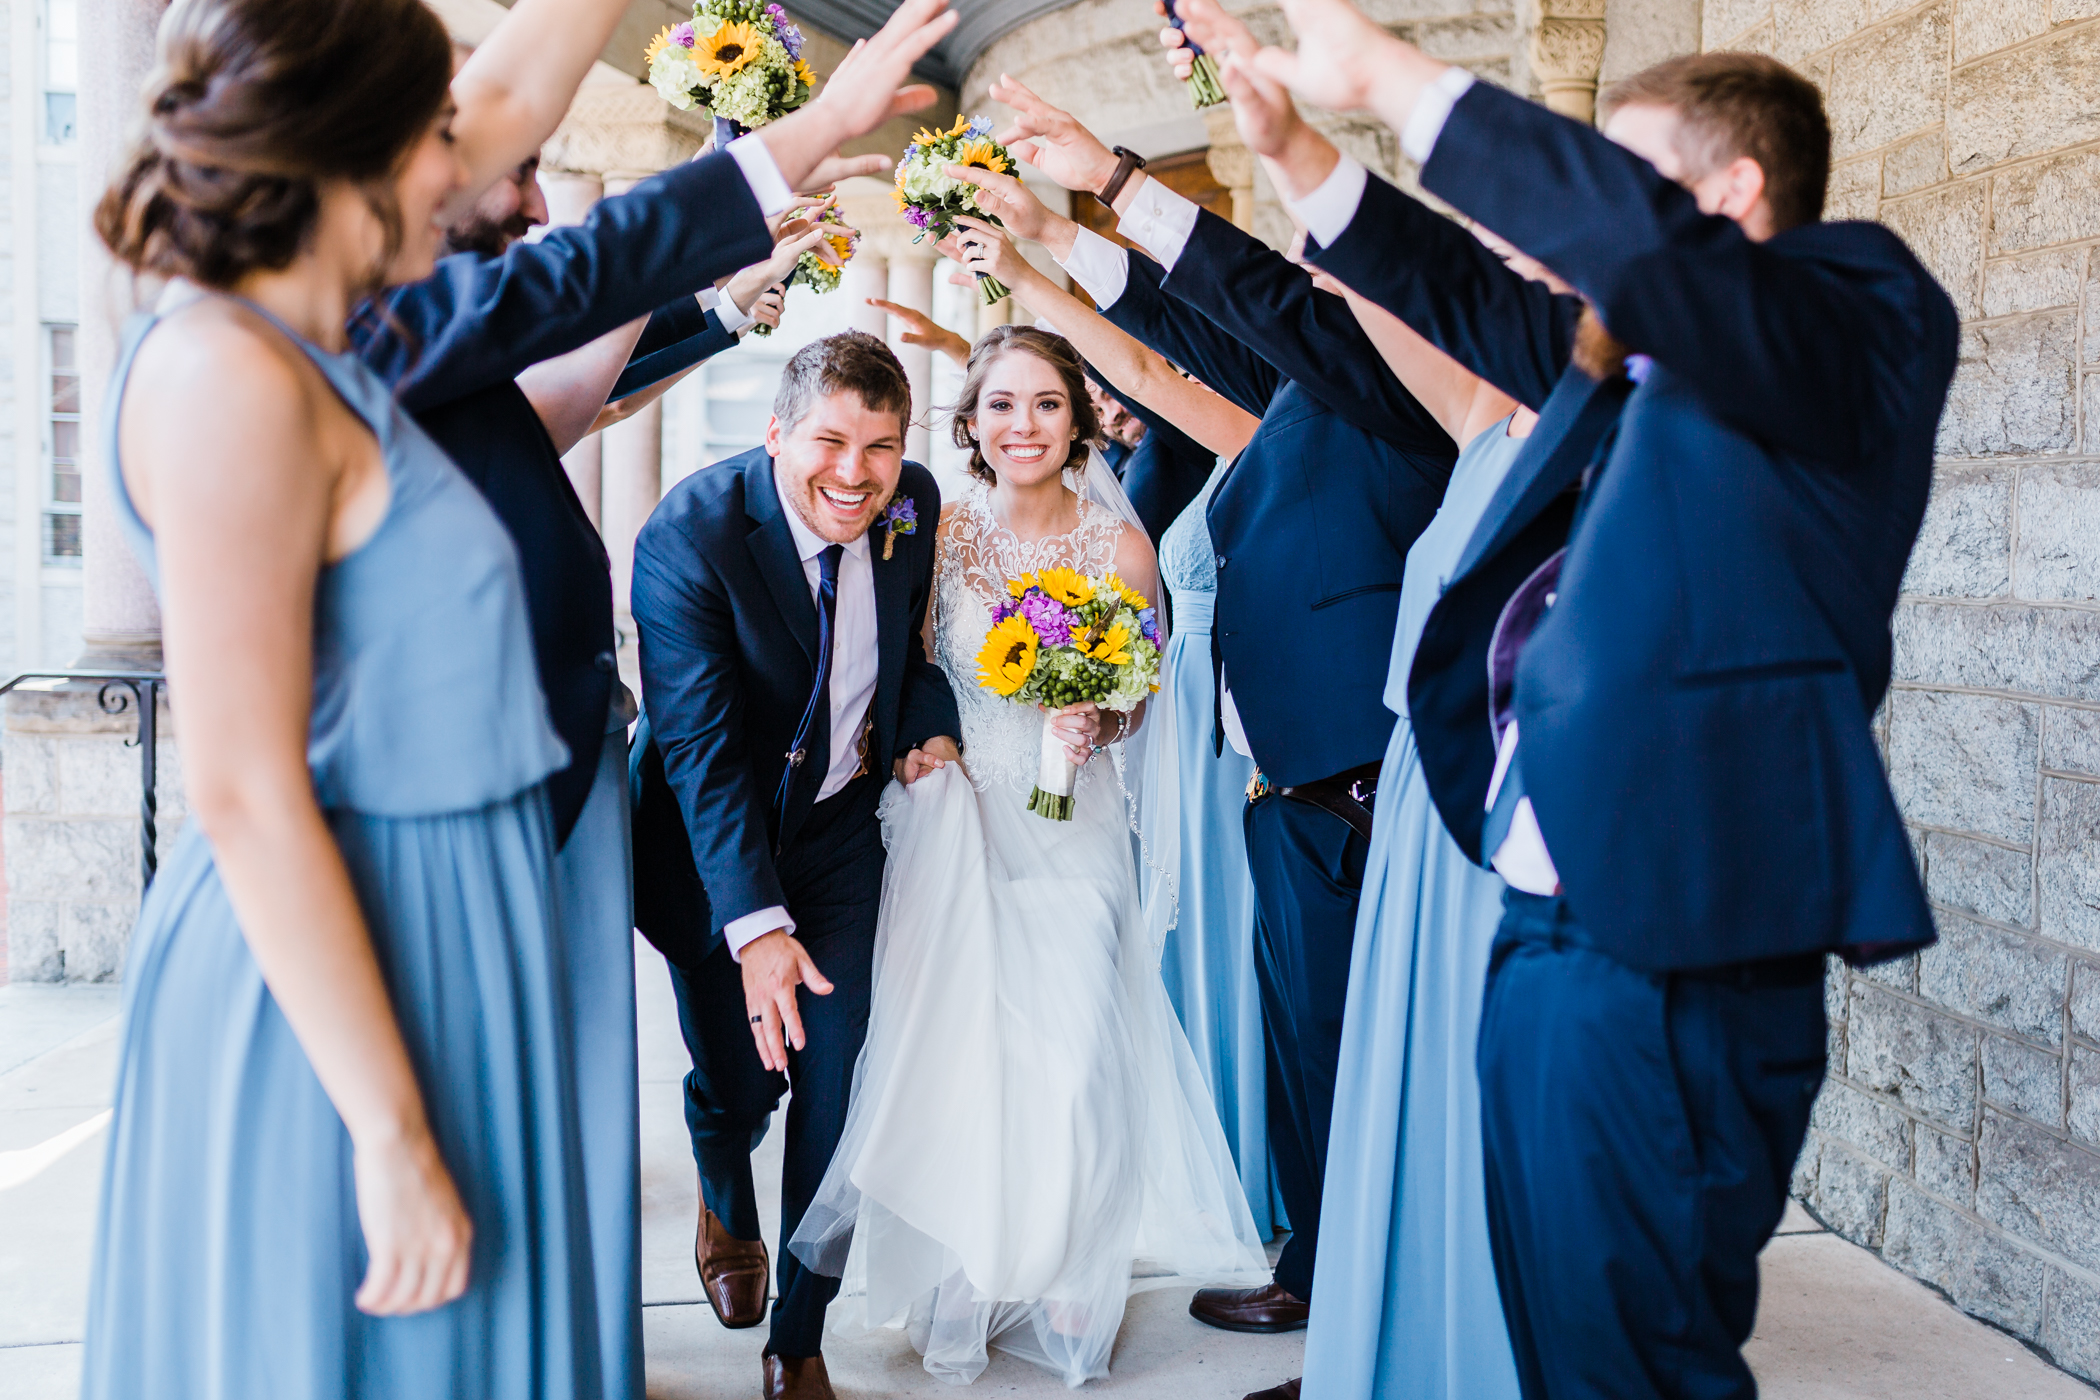 blue weddings and sunflowers - fun bridal party photos - baltimore wedding photographer